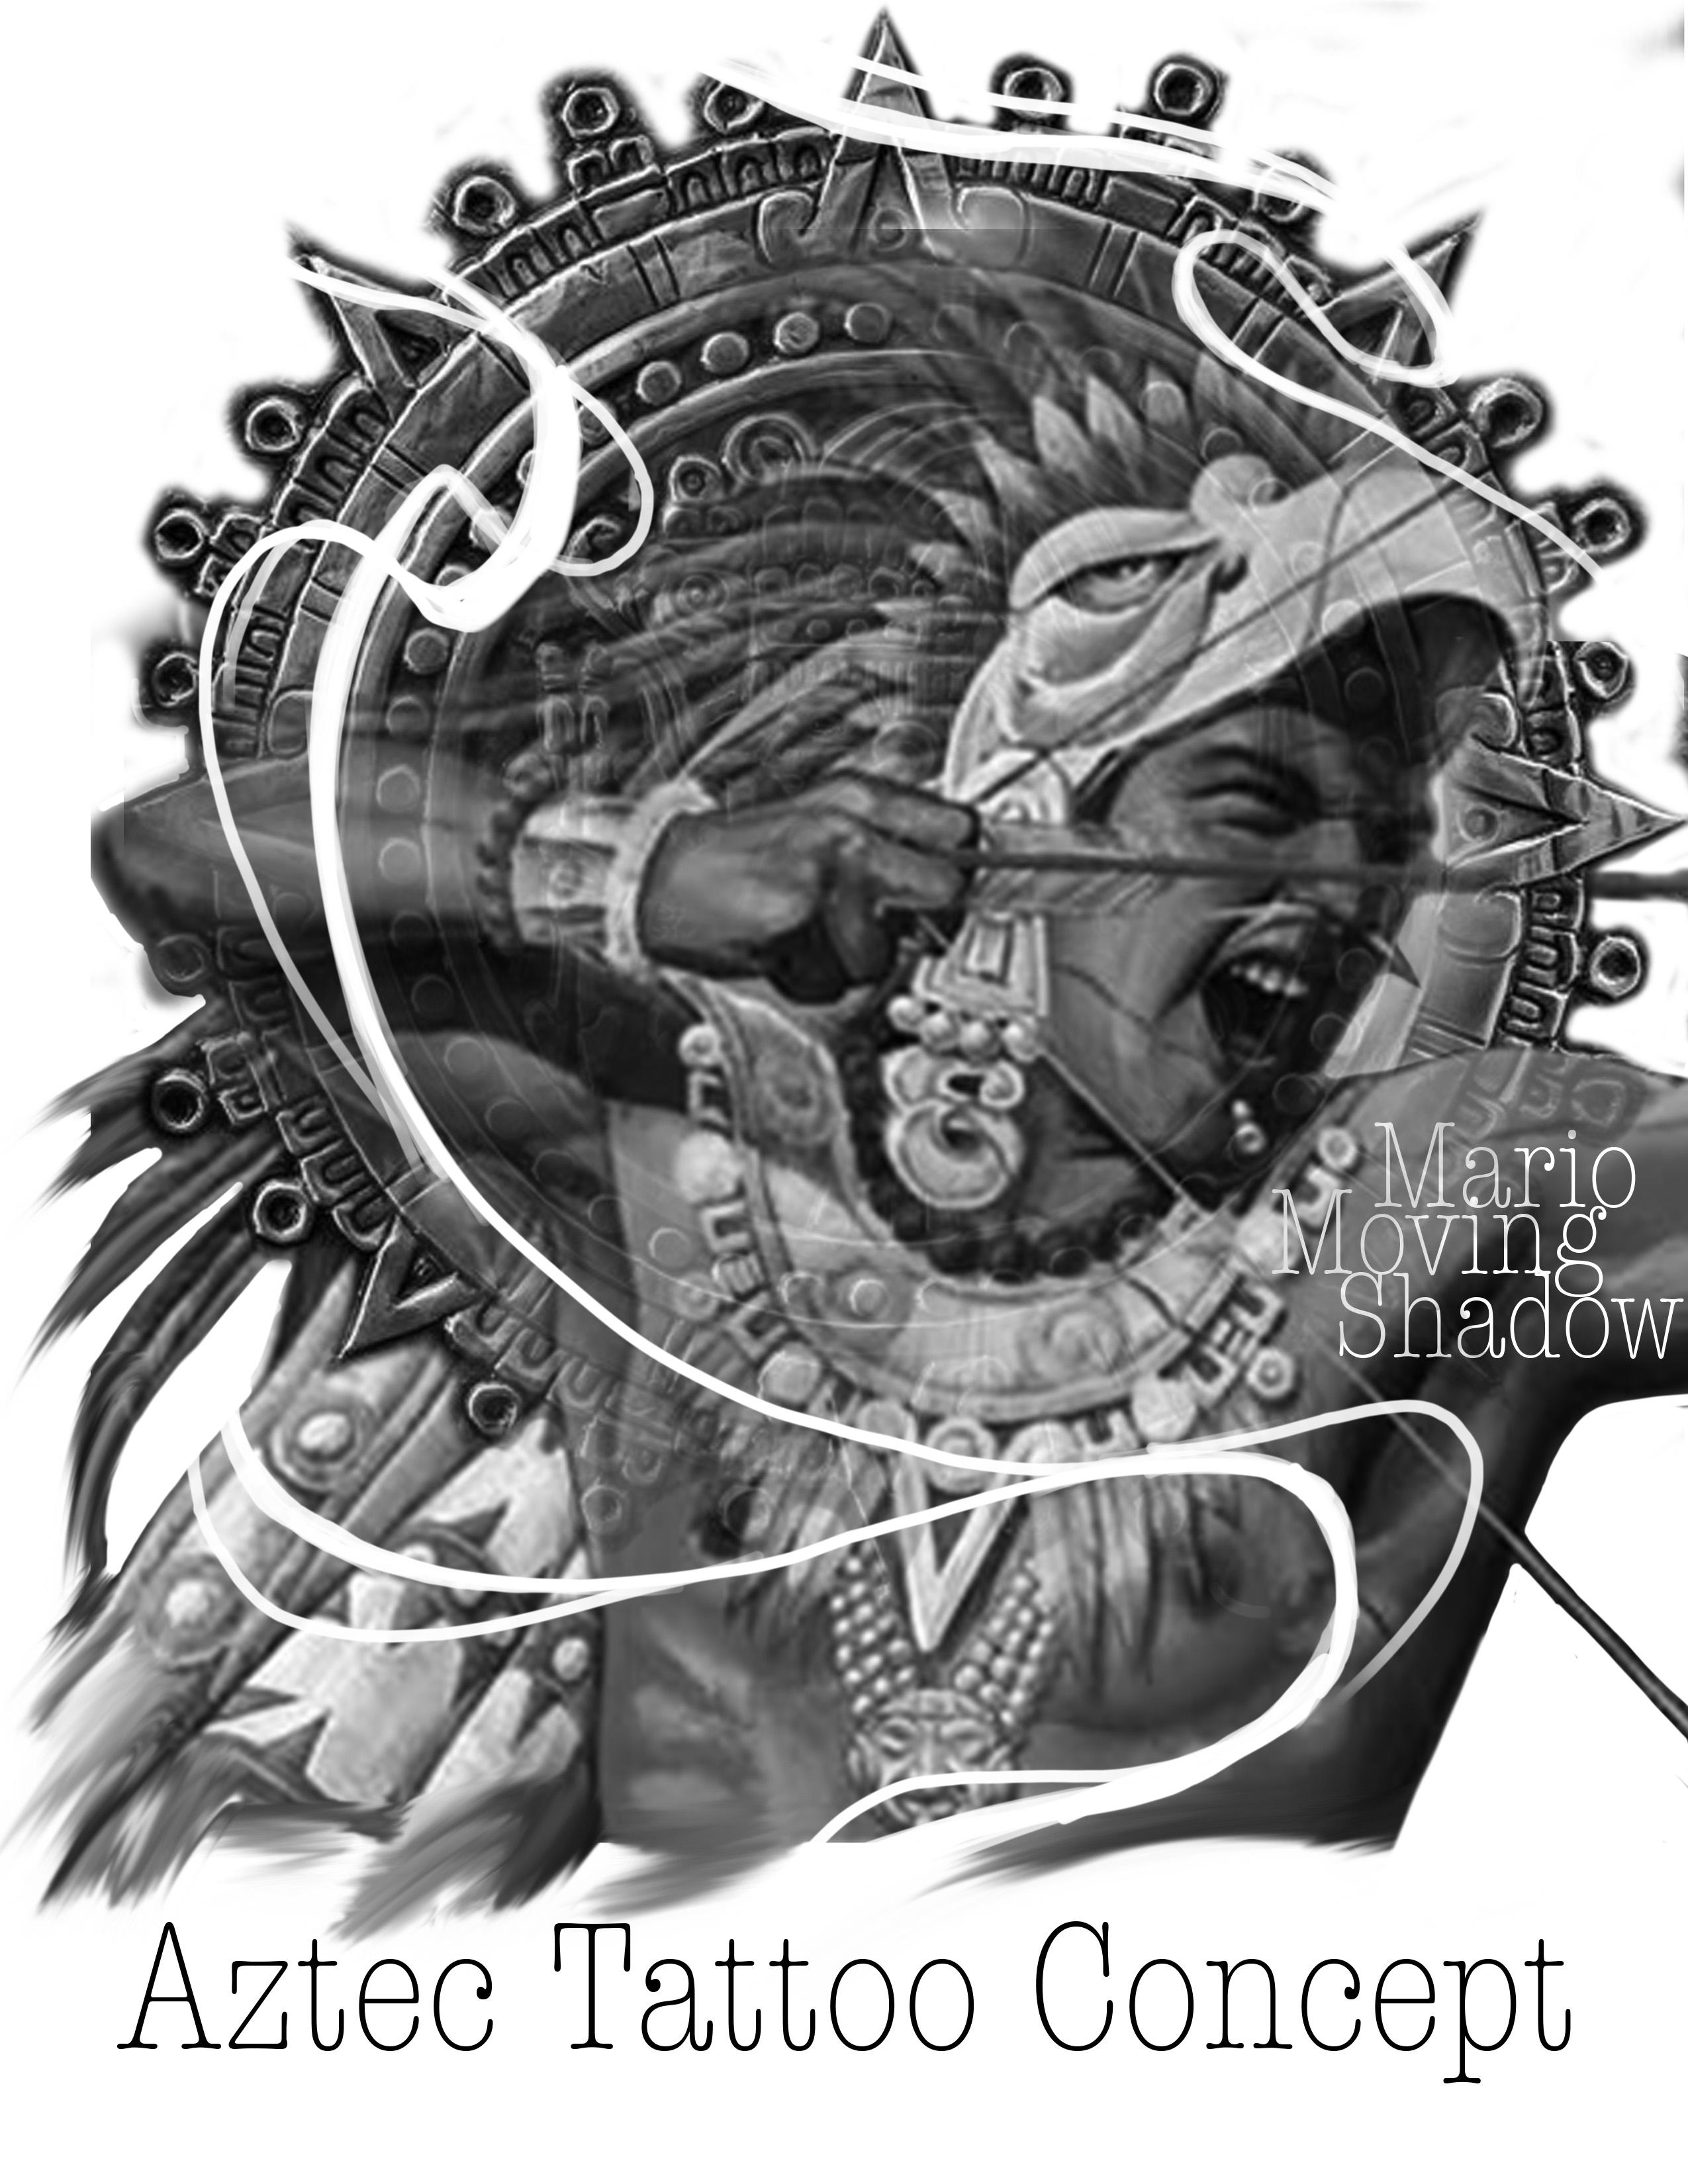 Aztec tattoo concept